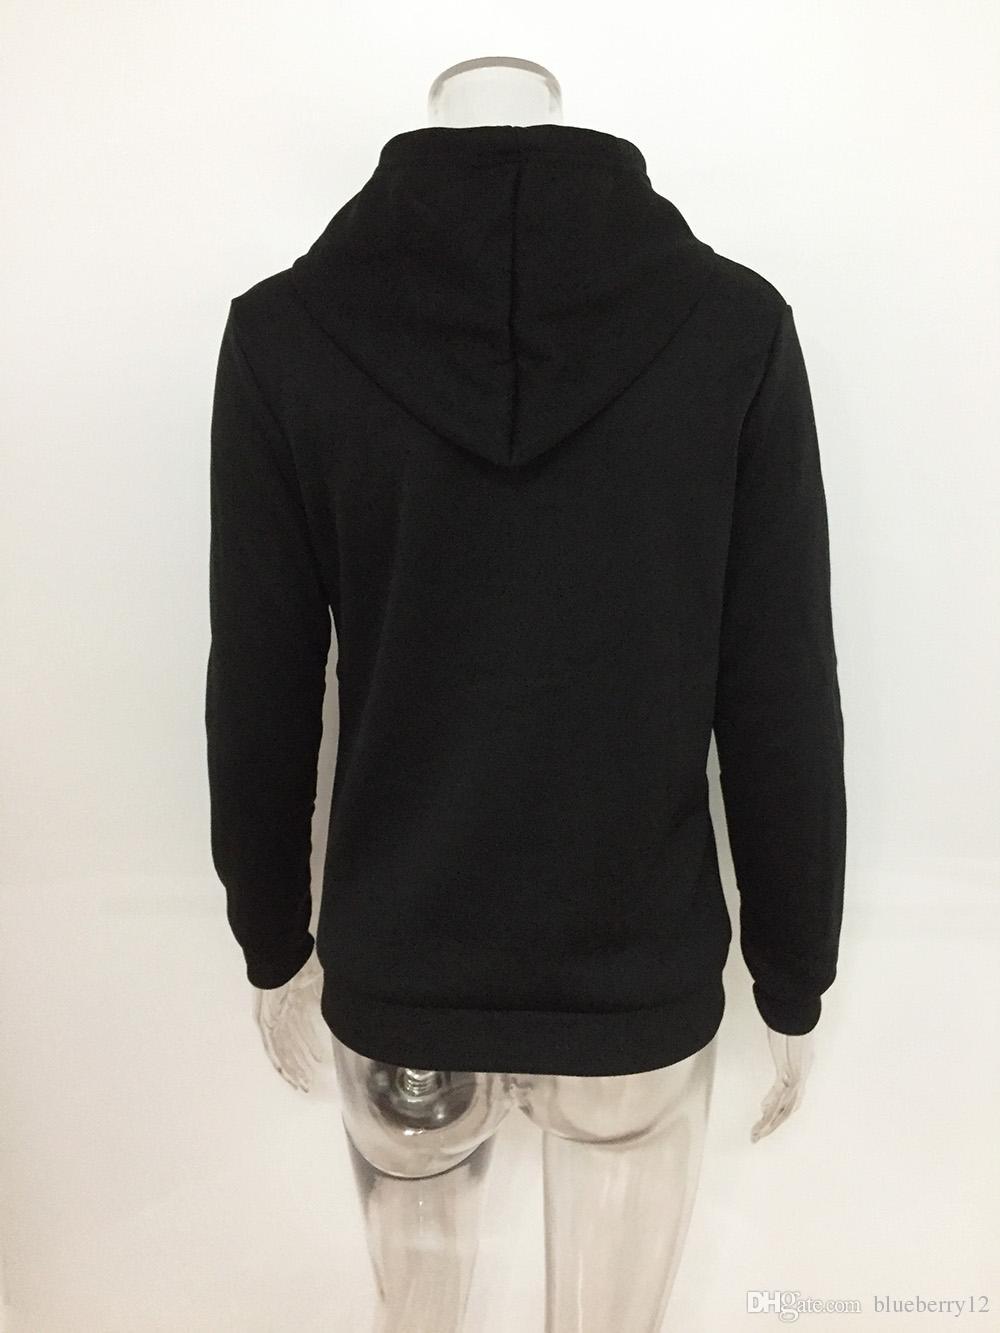 Fashion American Eur Style Herbst Pullover Einhorn Printed Long-sleeved Frauen Pullover Casual Hoodies Top Kleidung